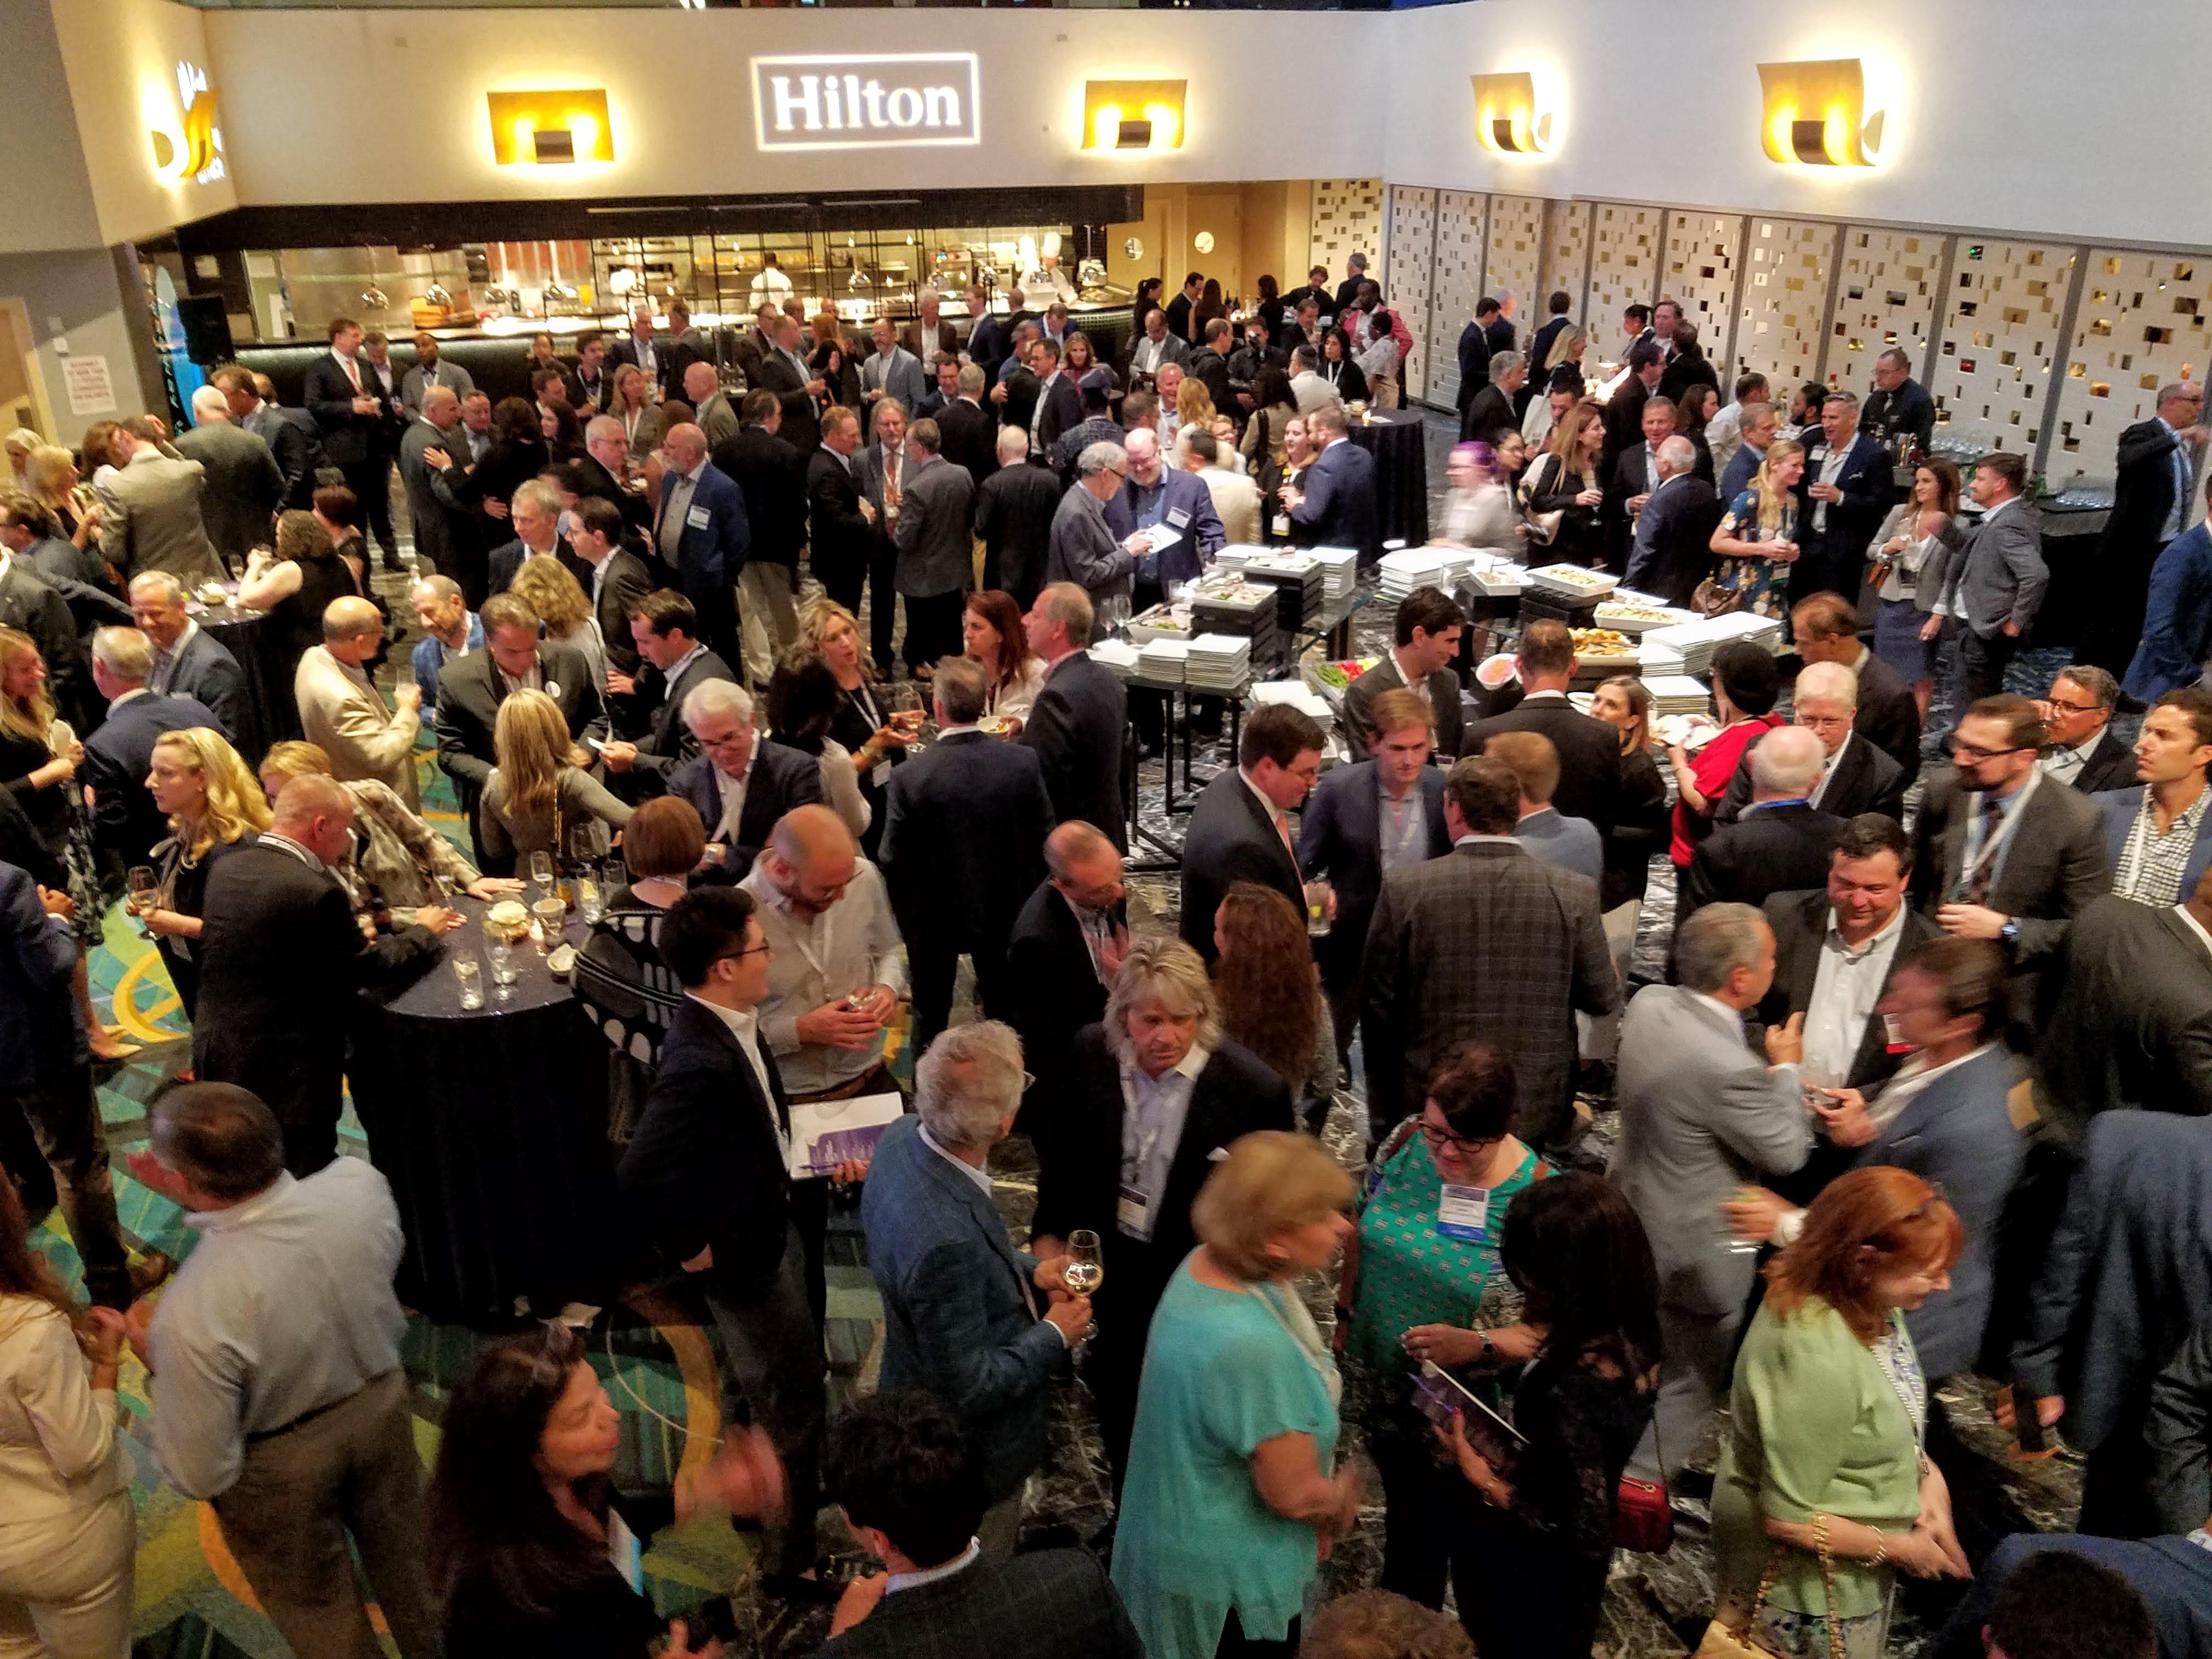 Hilton, celebrating its centenary, sponsored the opening reception.